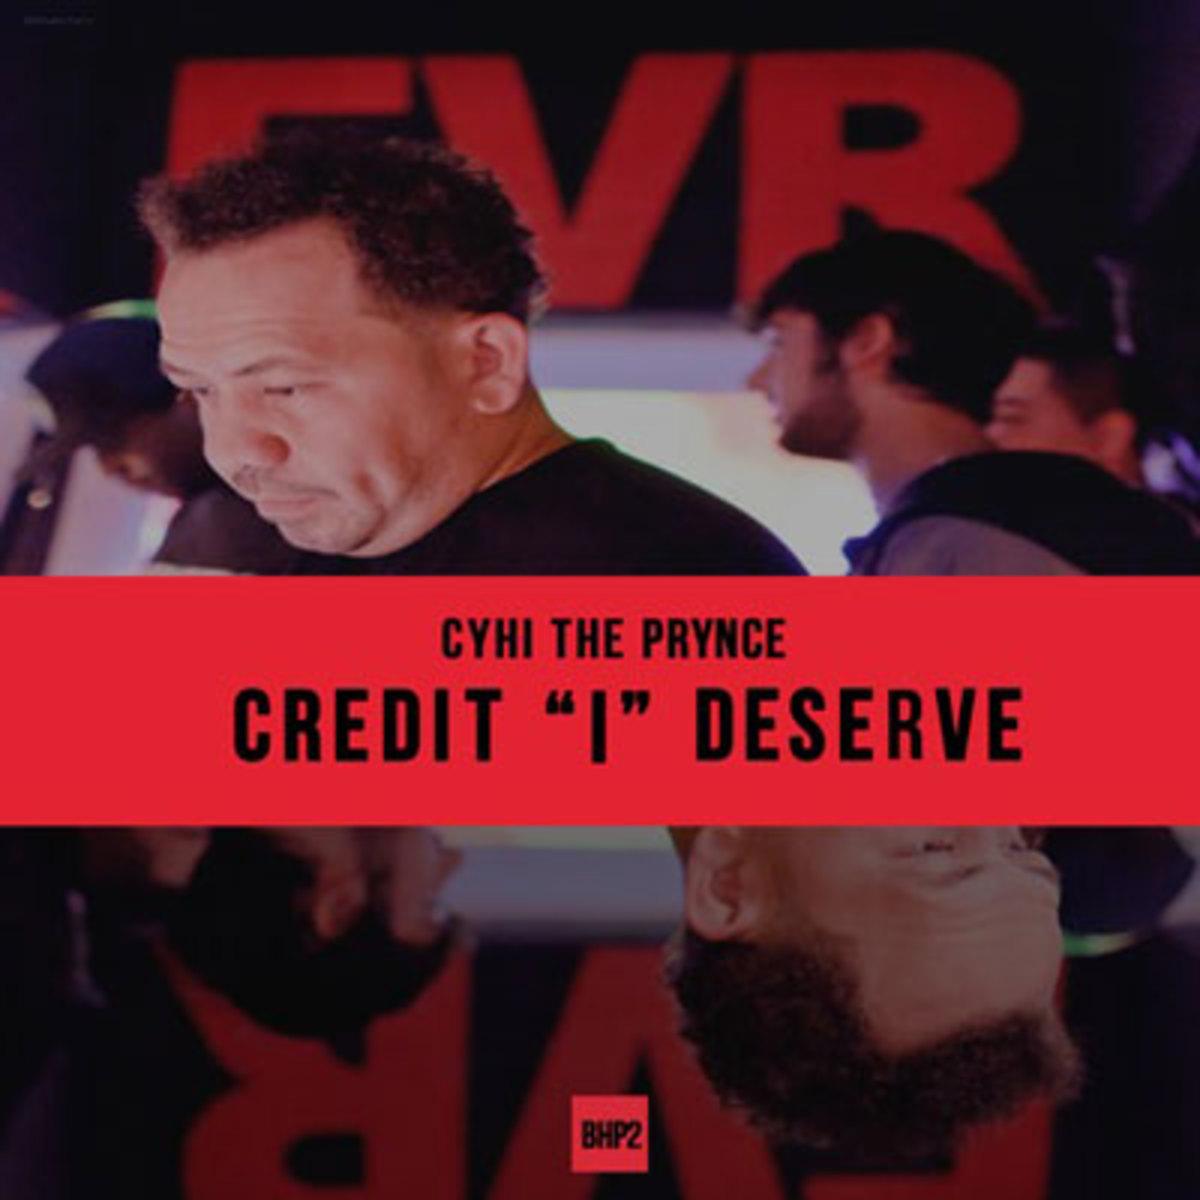 cyhitheprynce-crediti.jpg